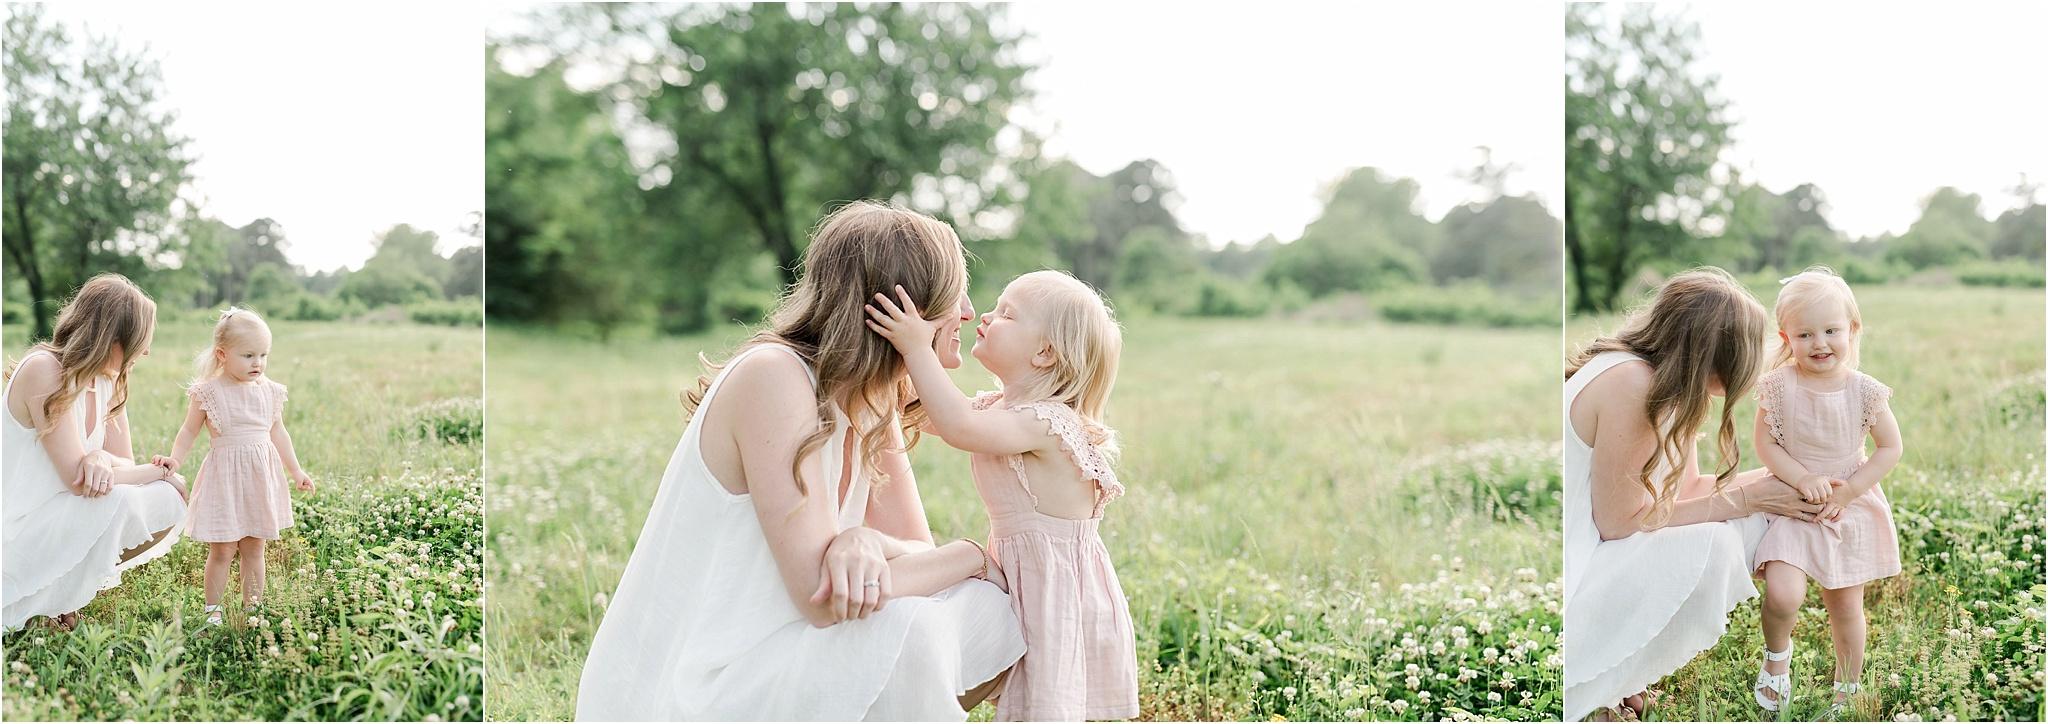 Rachel_Bond_Birmingham_AL-family-photography_0019.jpg